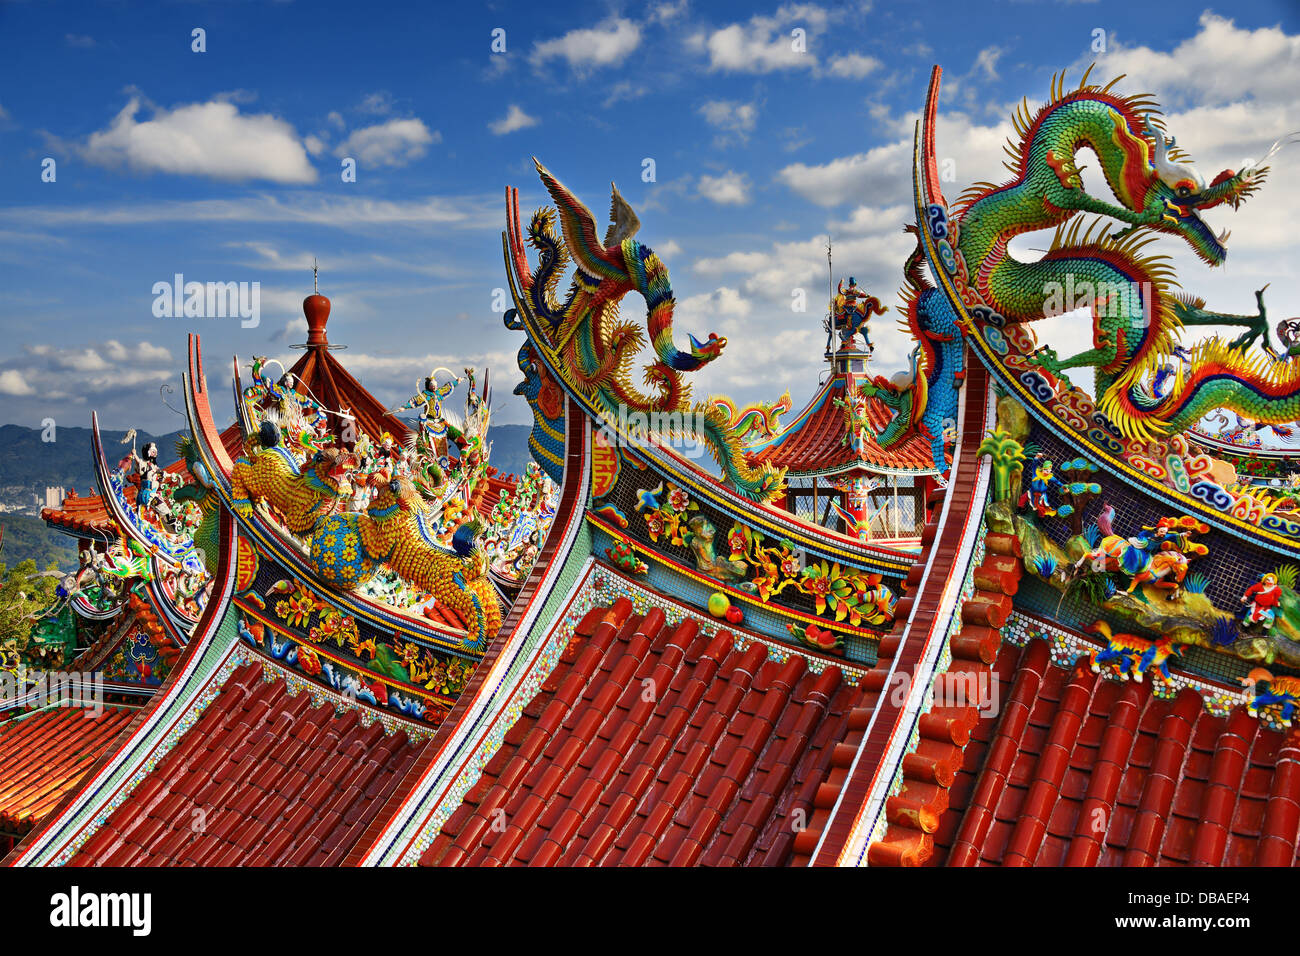 Templo Chino en Bishan ornamentado Templo en Taipei, Taiwán. Imagen De Stock